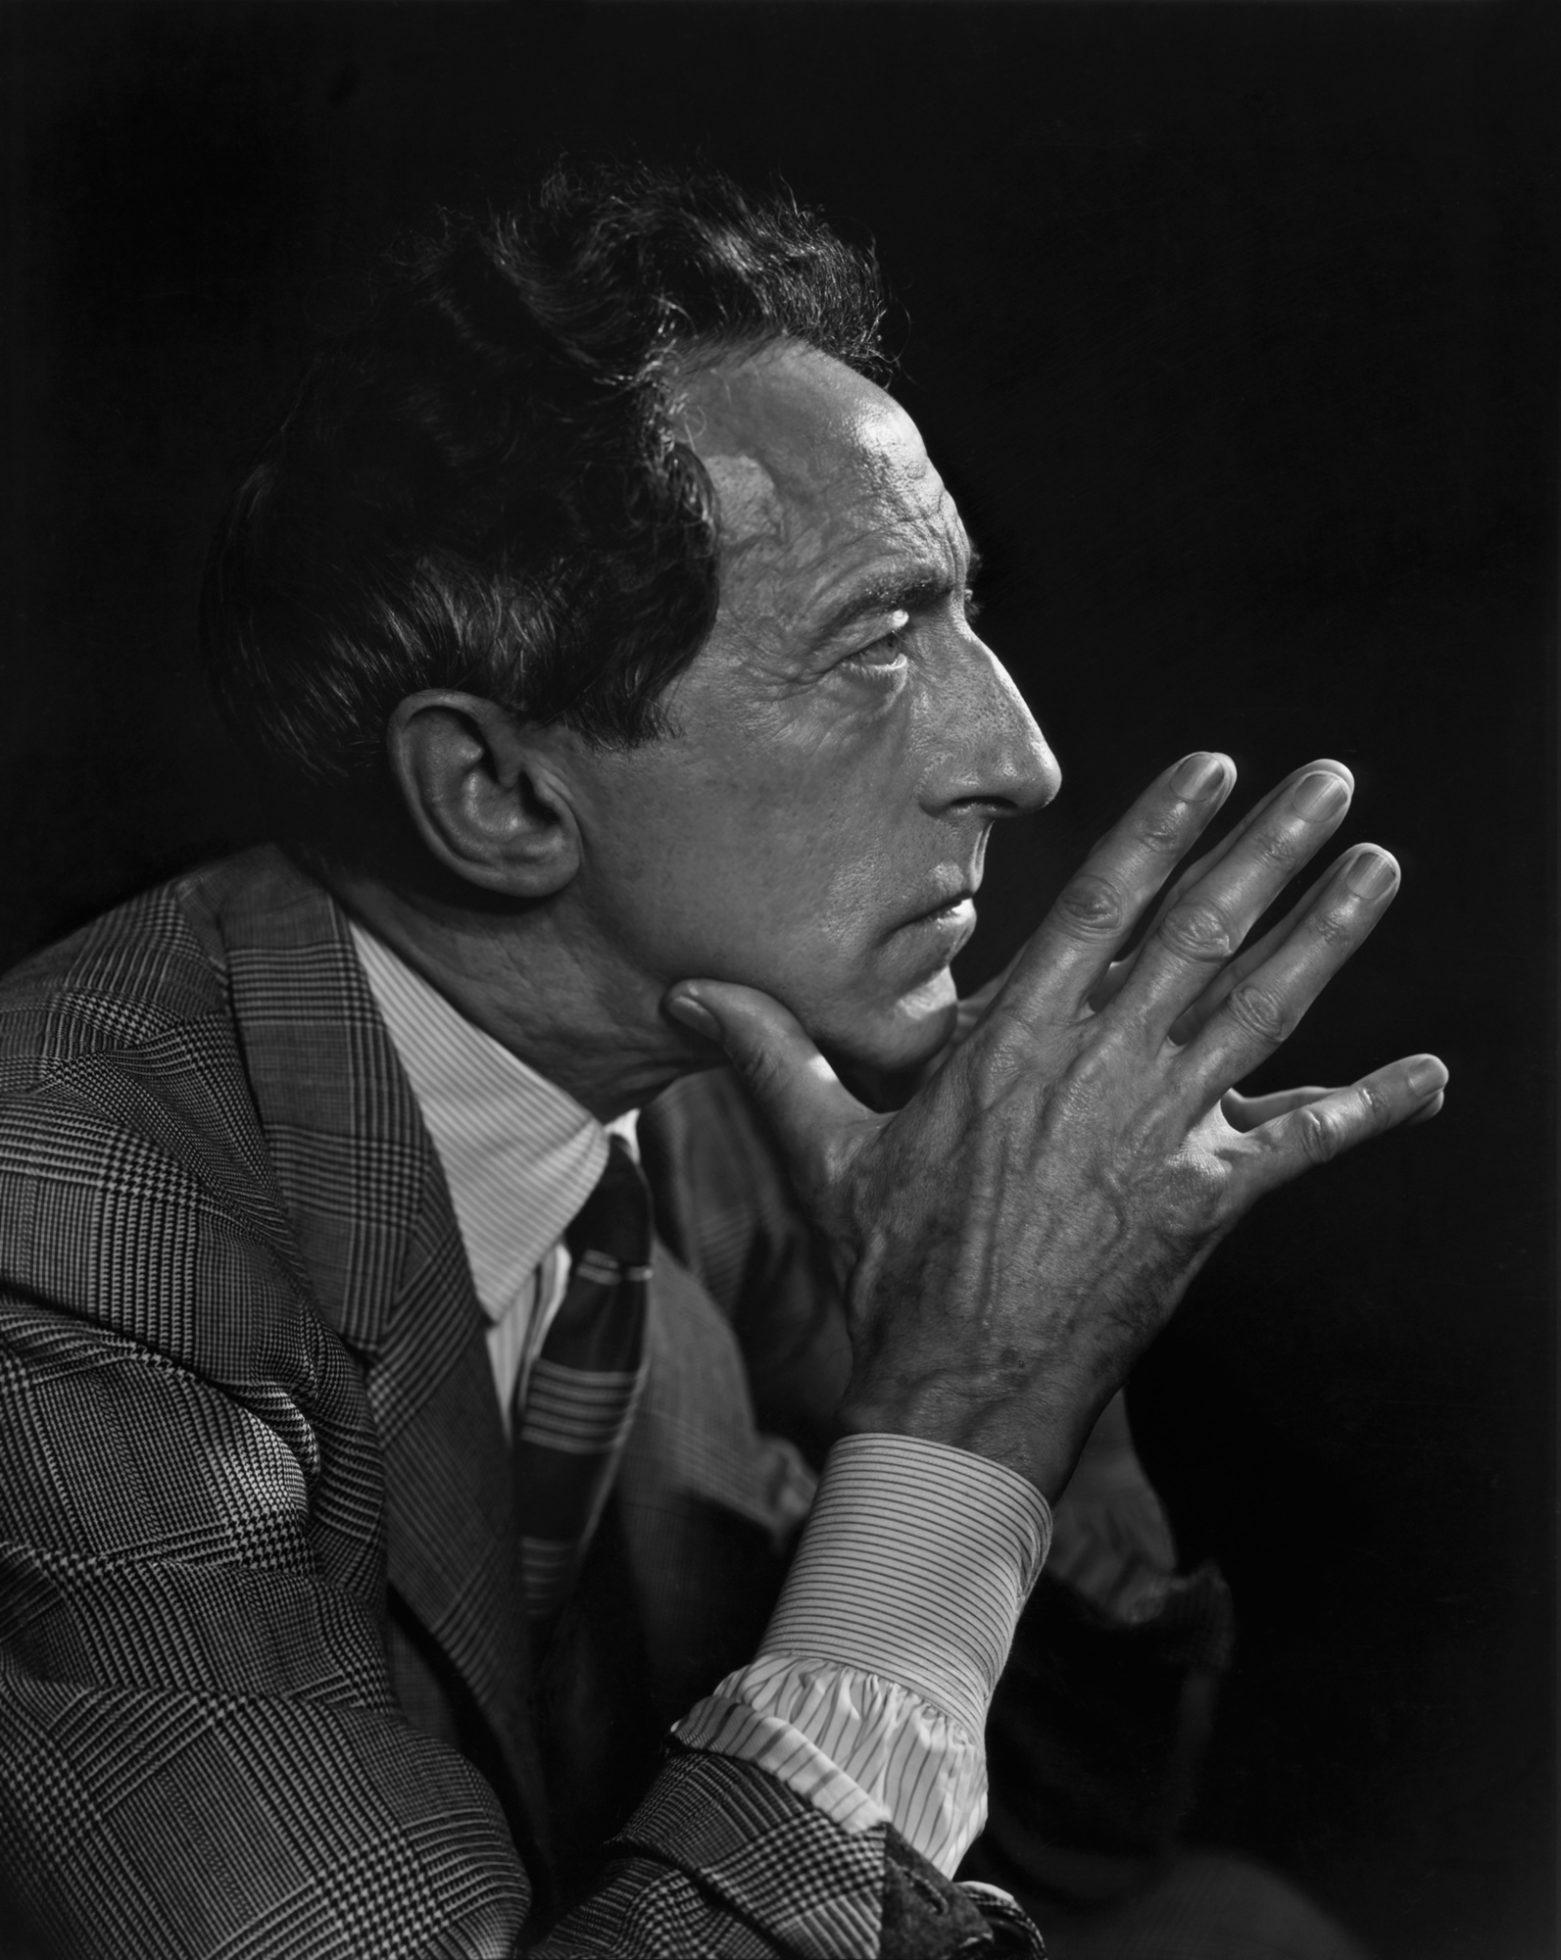 Jean Cocteau photo #5804, Jean Cocteau image